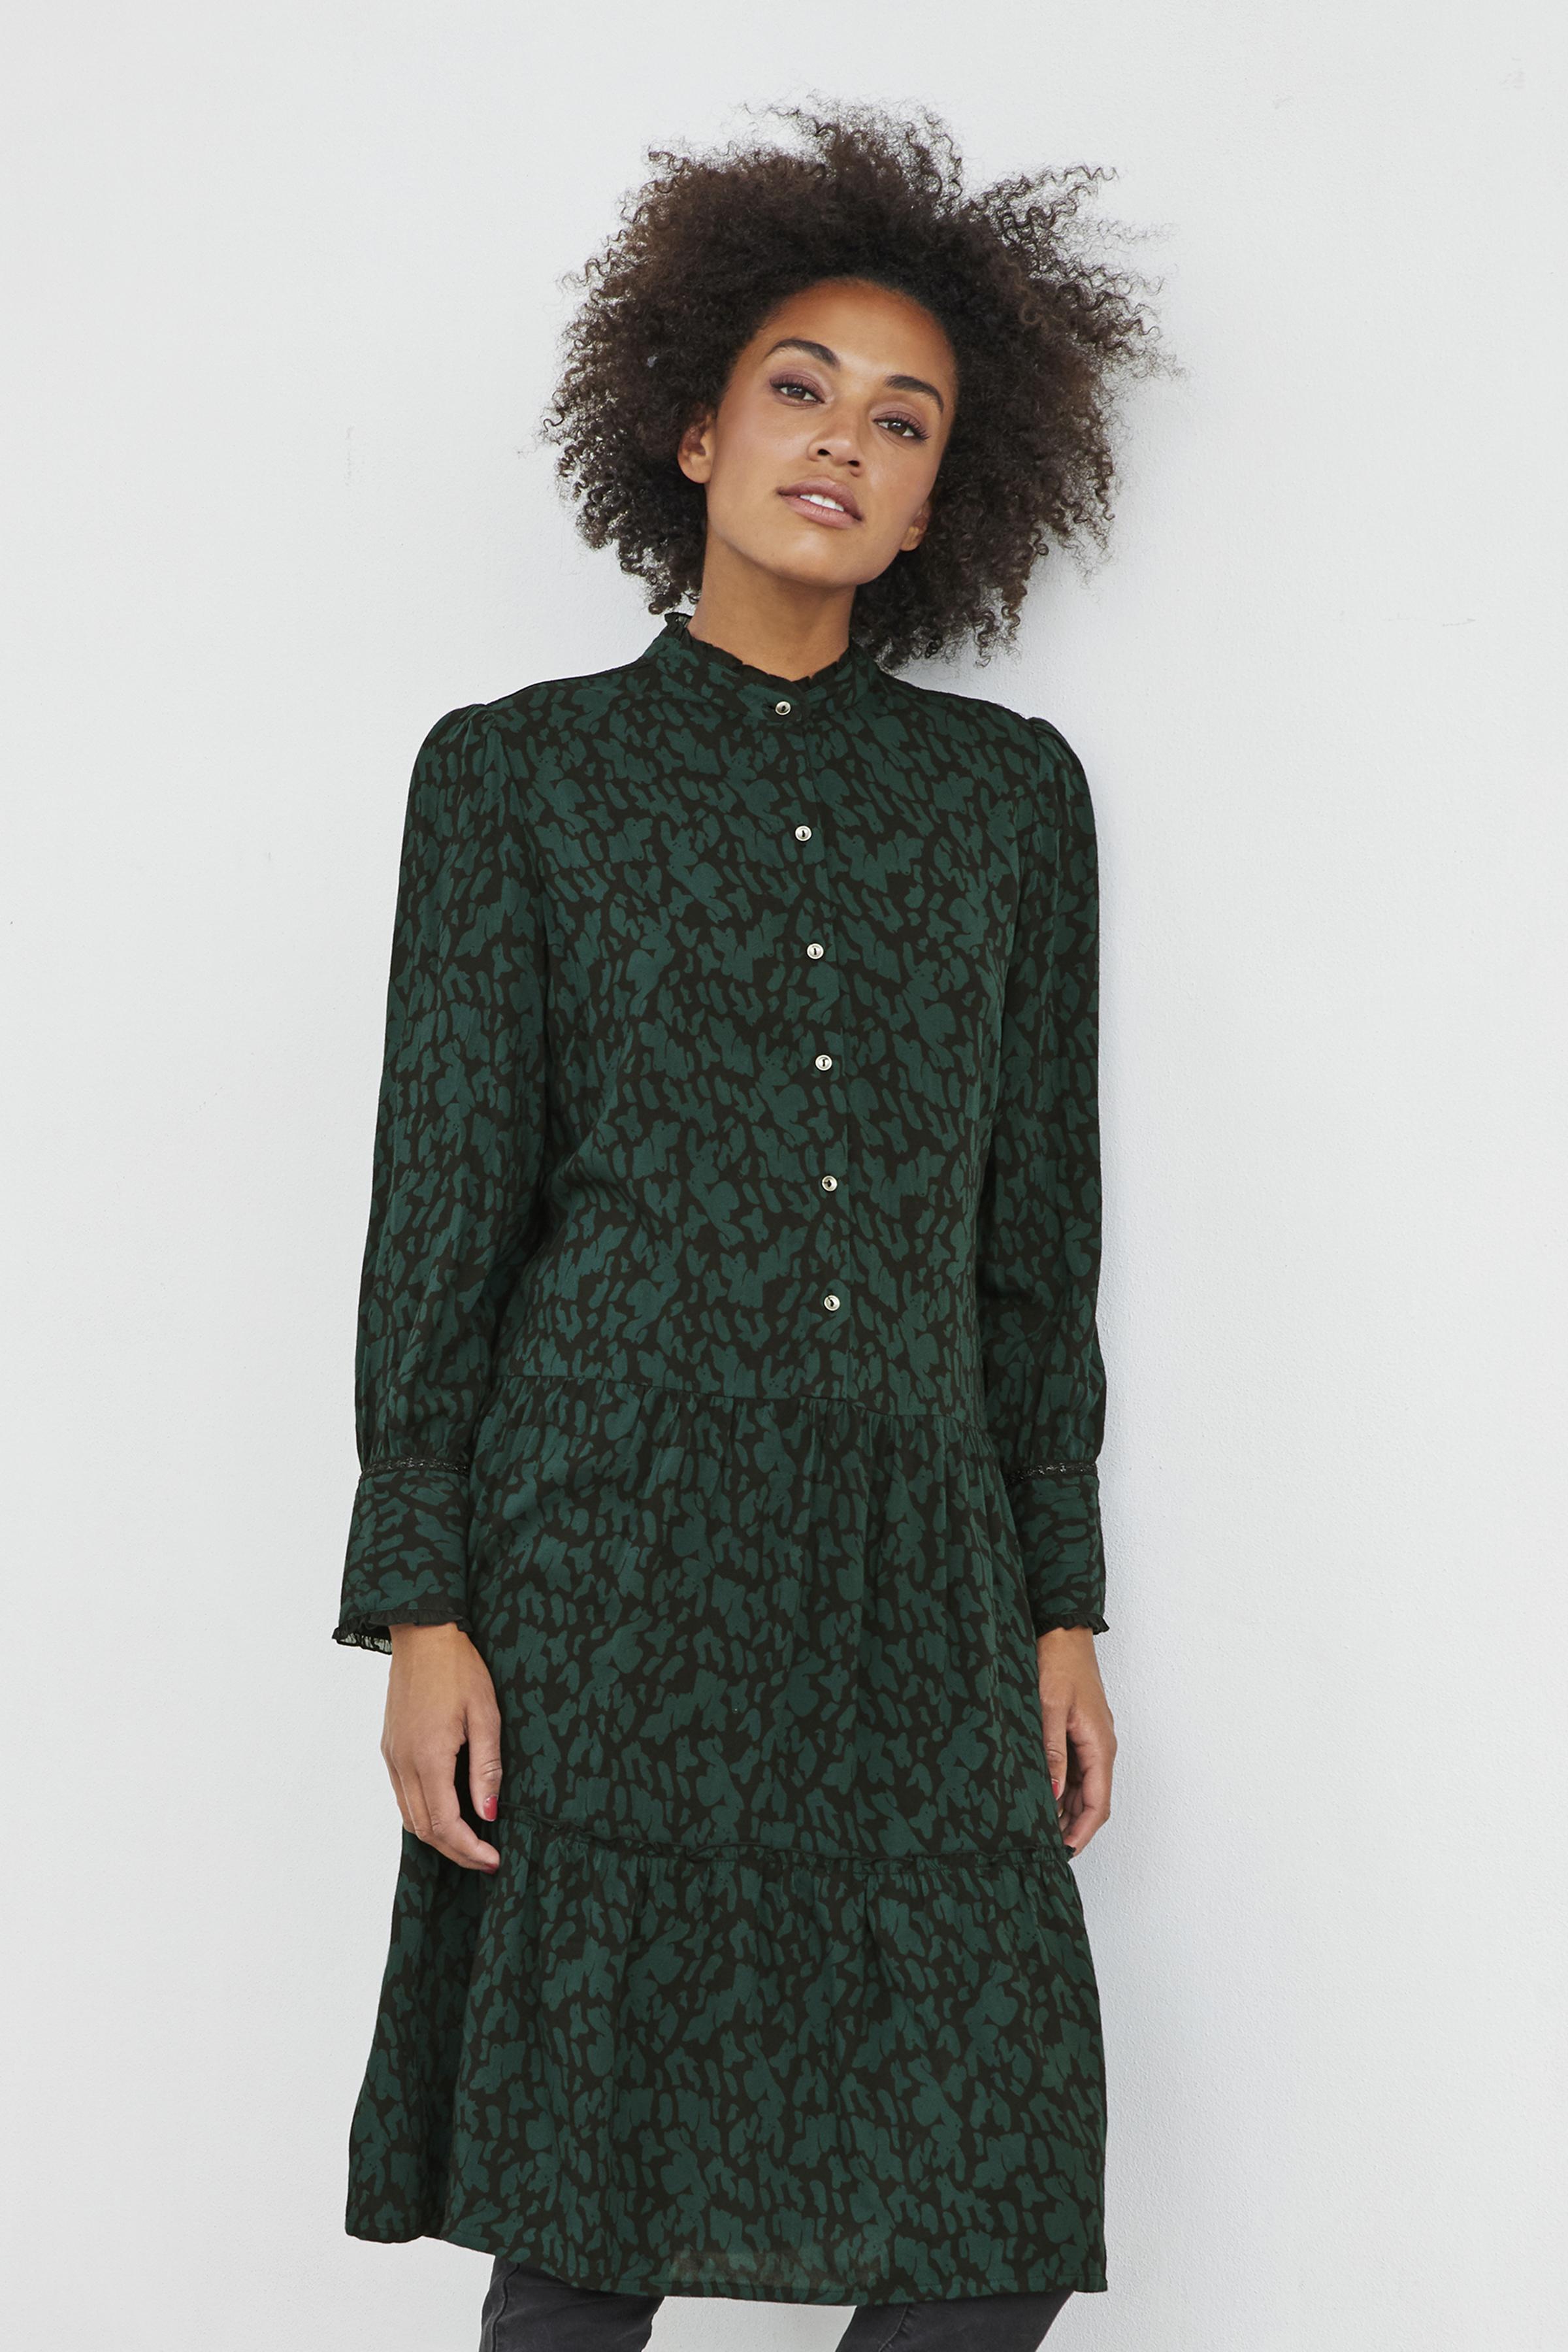 Mörkgrön/svart Klänning från Bon'A Parte – Köp Mörkgrön/svart Klänning från stl. S-2XL här